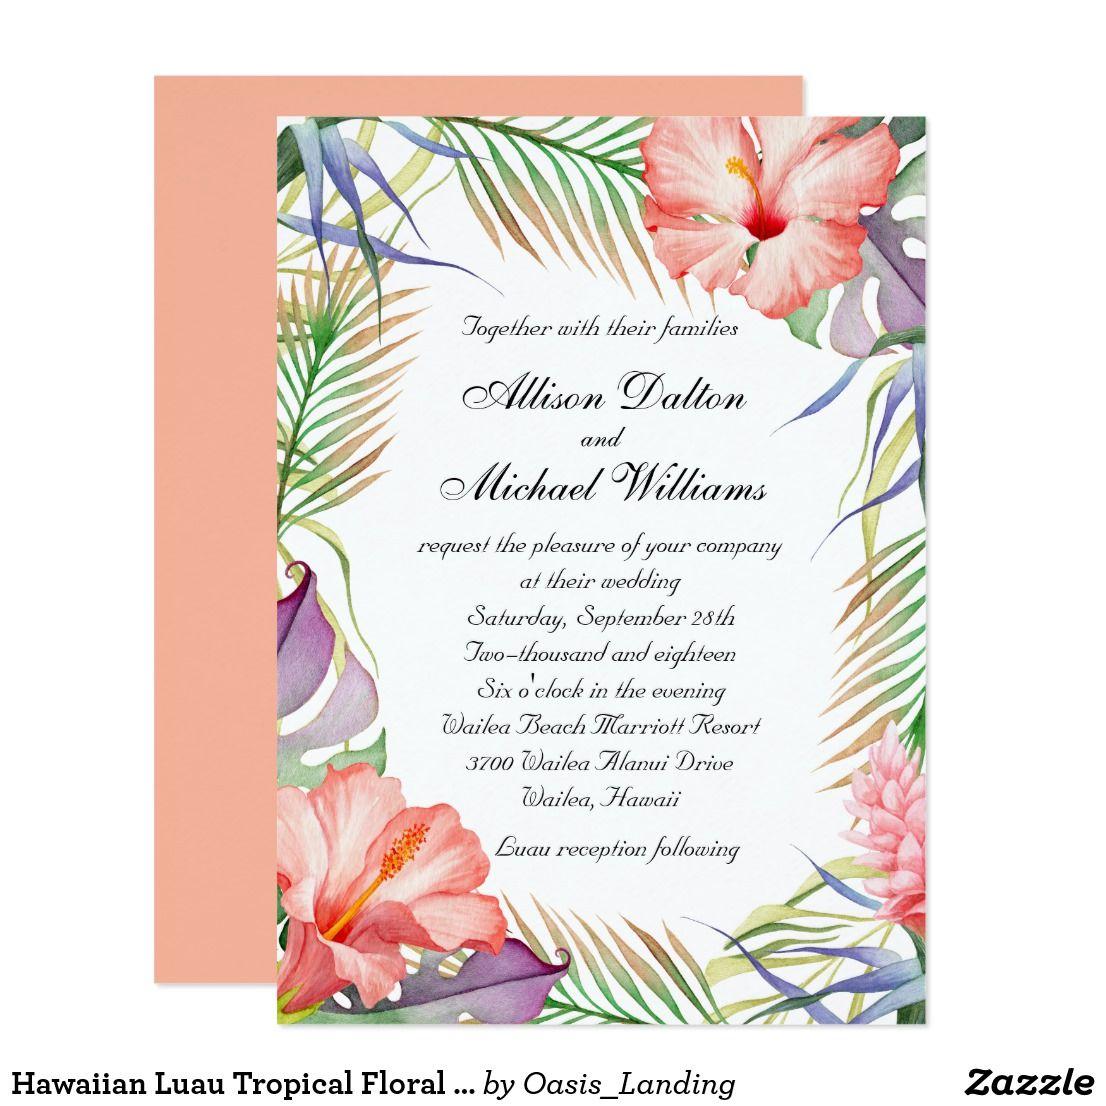 Hawaiian Luau Tropical Floral Wedding Card - This colorful floral ...